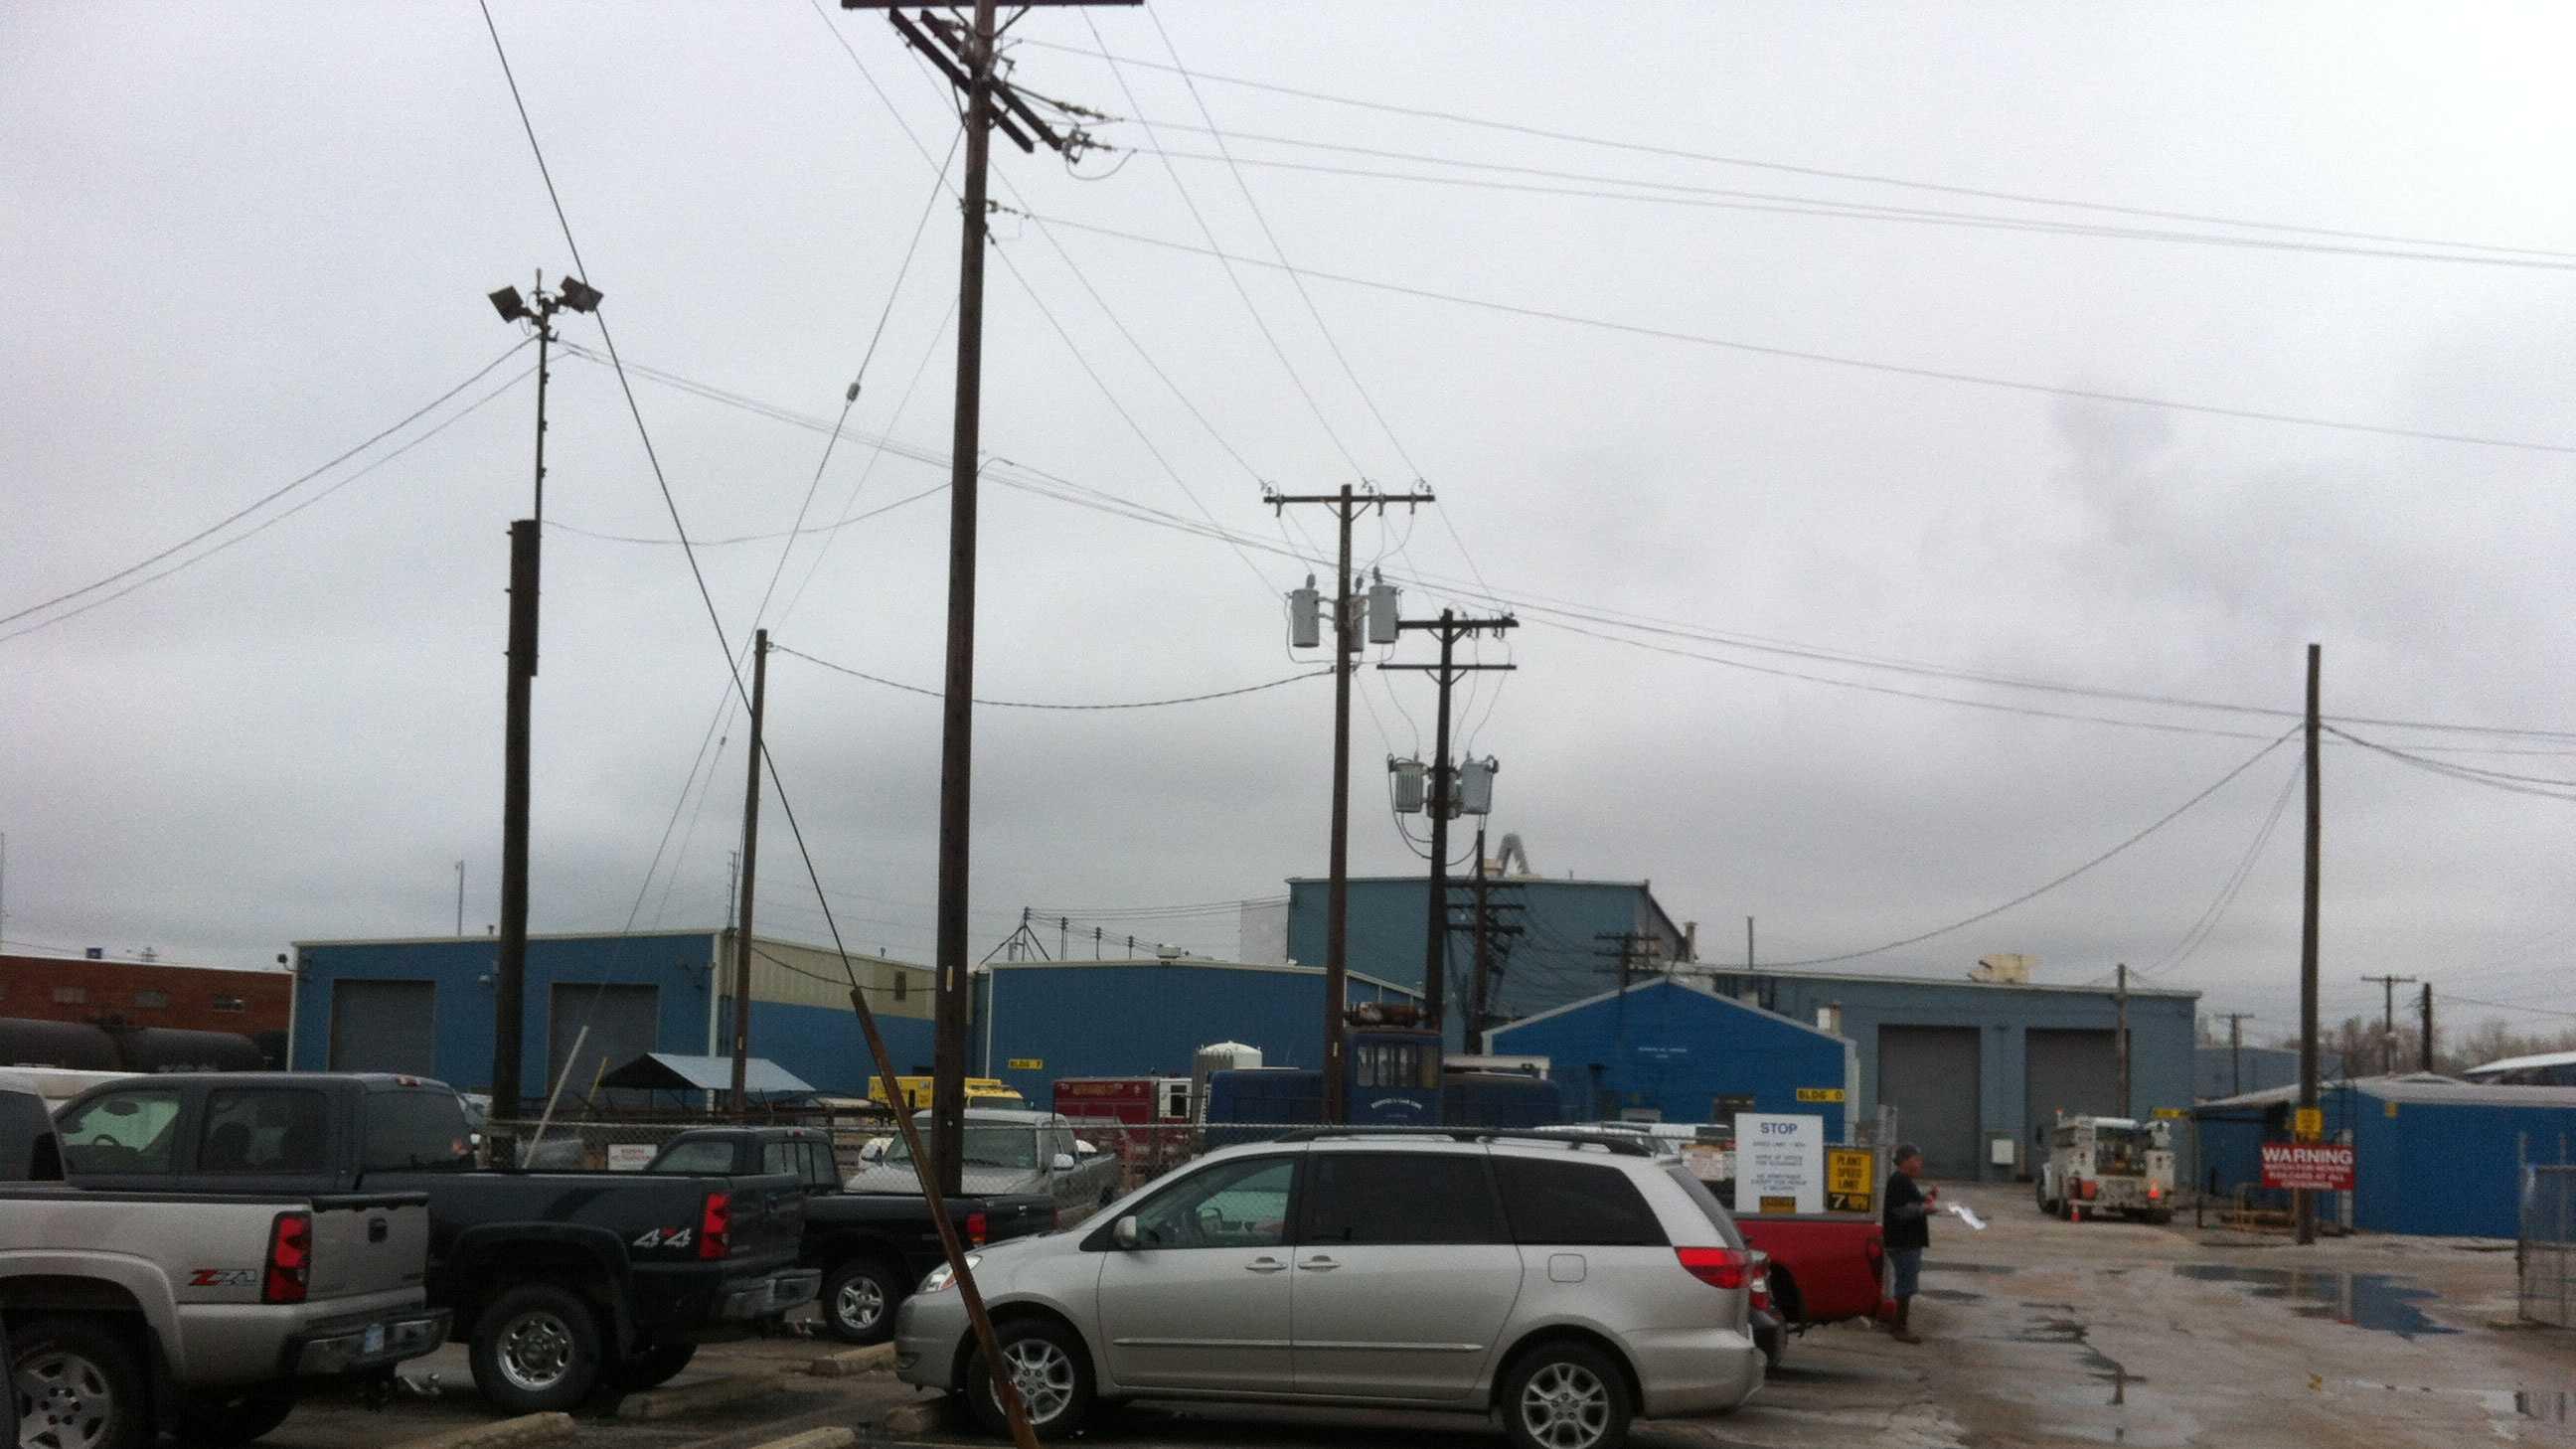 American Railcar Industries, fire